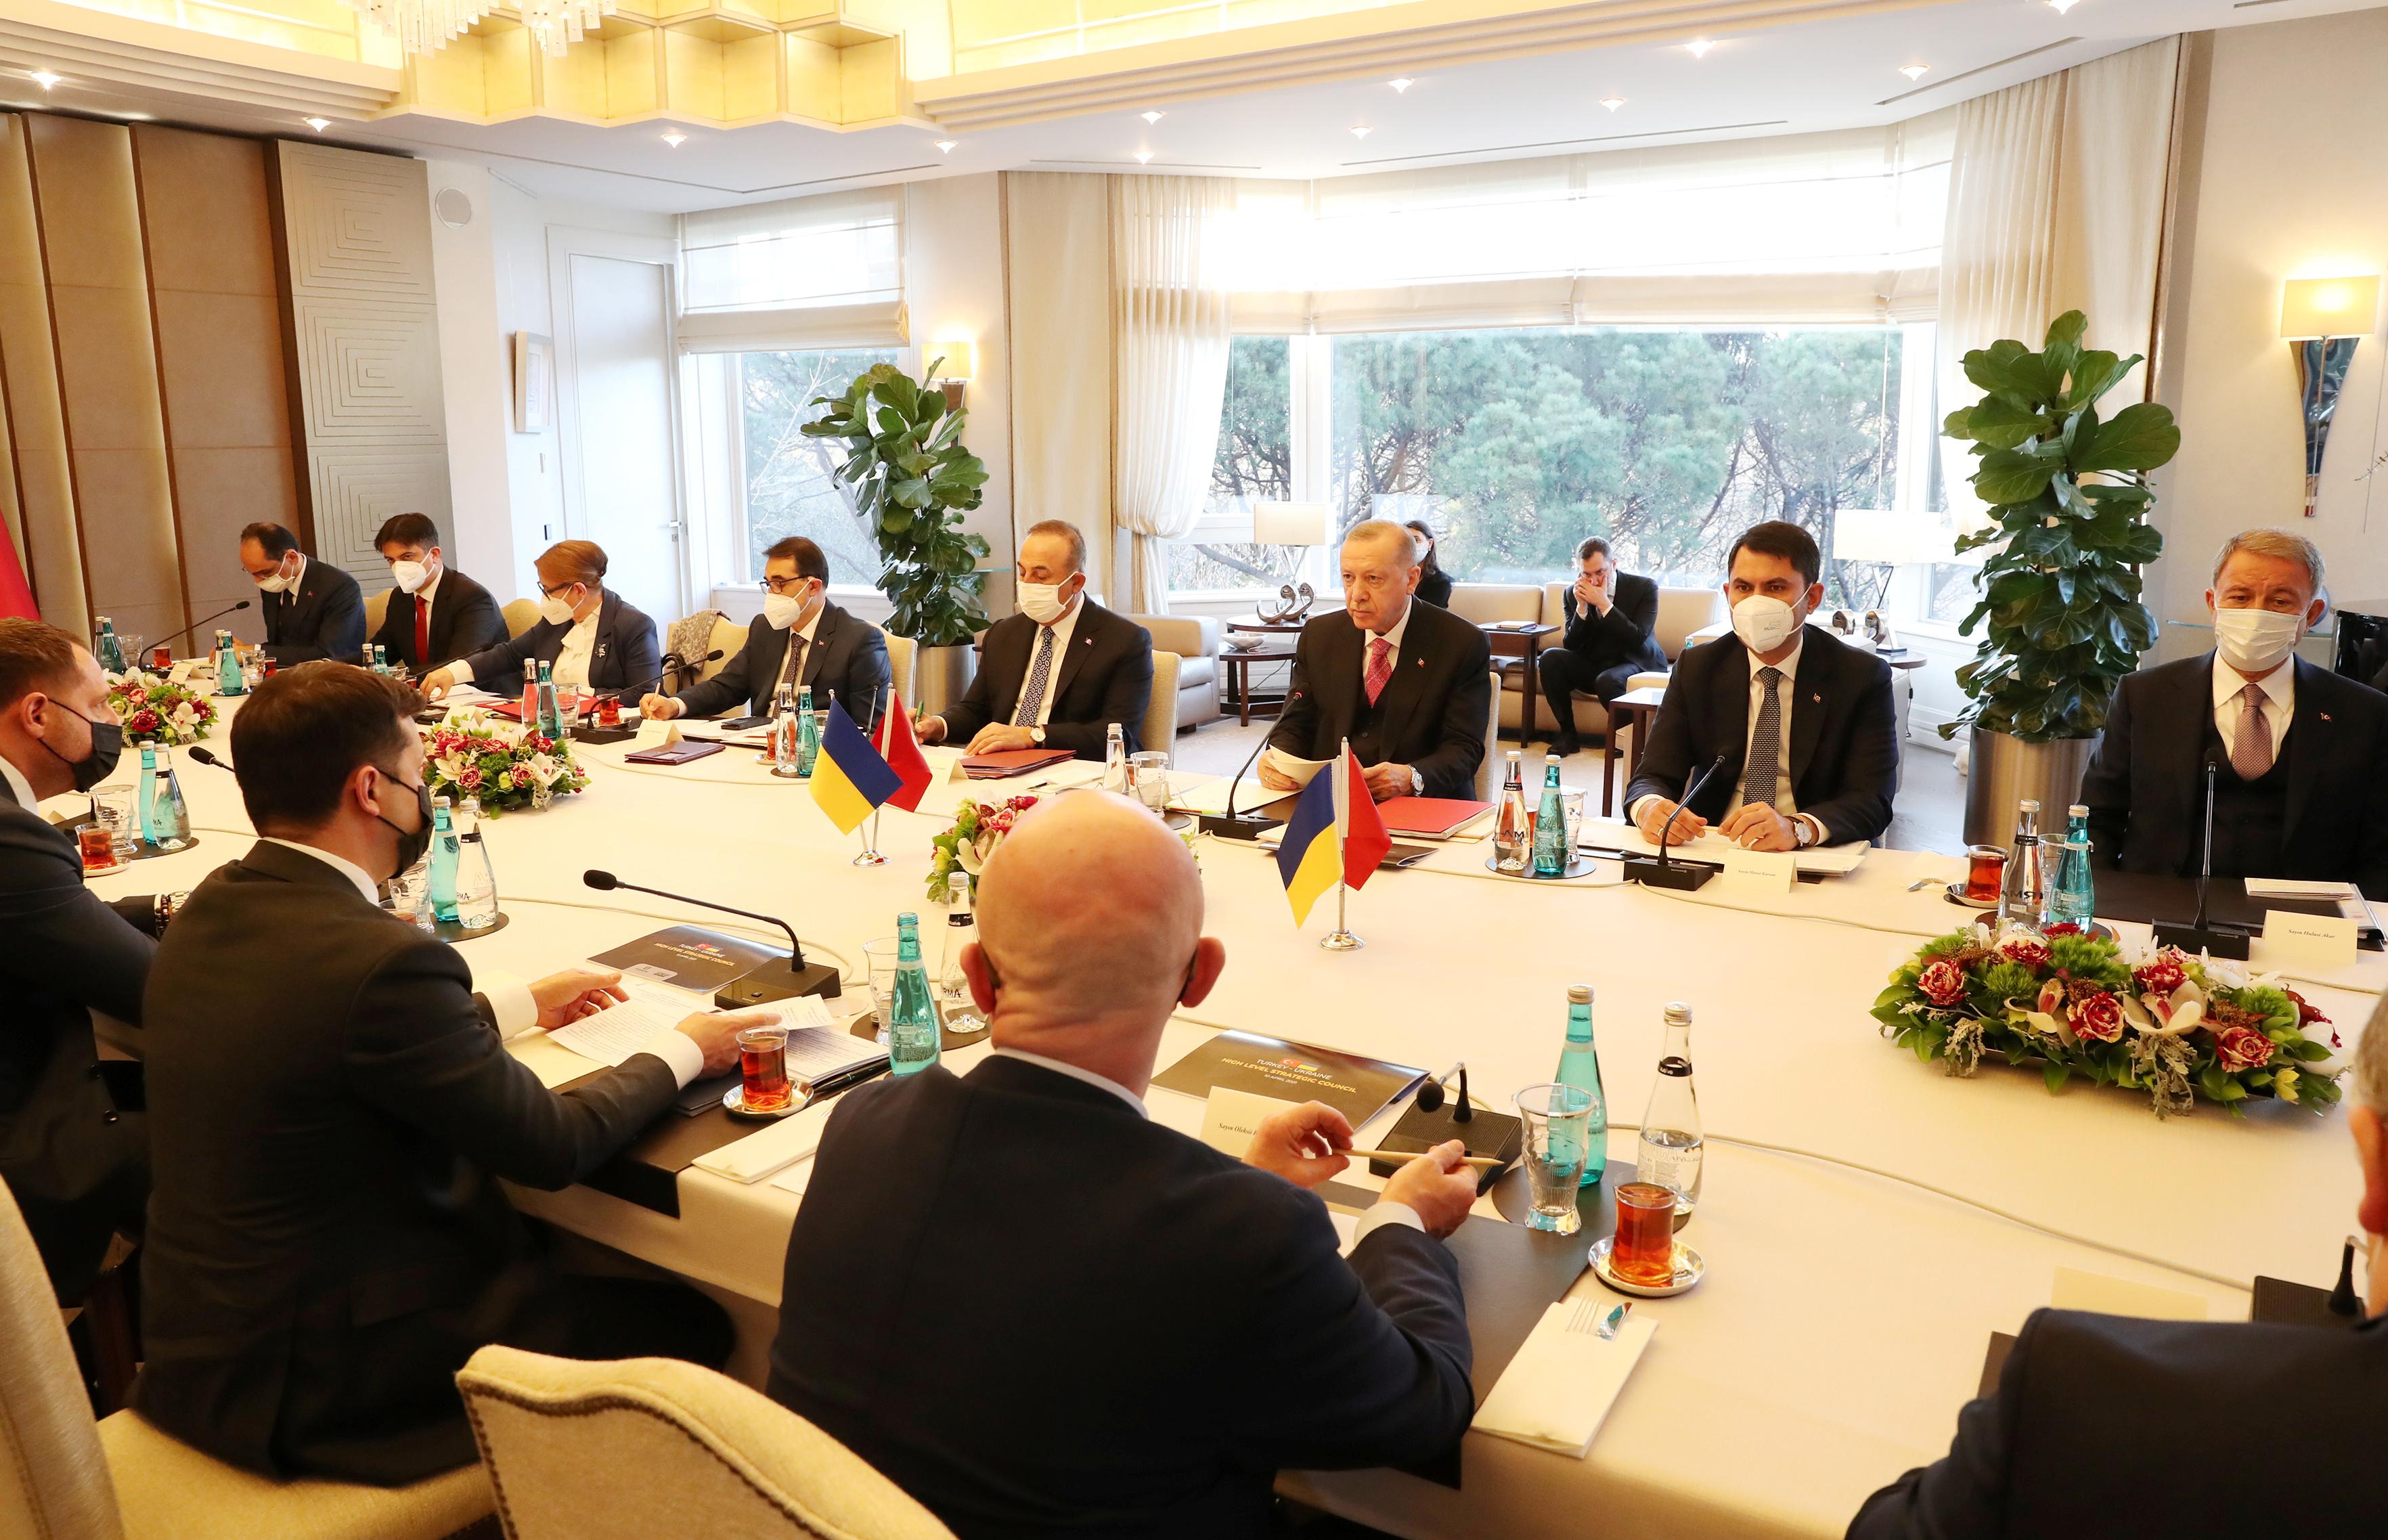 Turkish President Tayyip Erdogan and Ukraine's President Volodymyr Zelenskiy attend a meeting in Istanbul, Turkey, April 10, 2021. Murat Cetinmuhurdar/Presidential Press Office/Handout via REUTERS